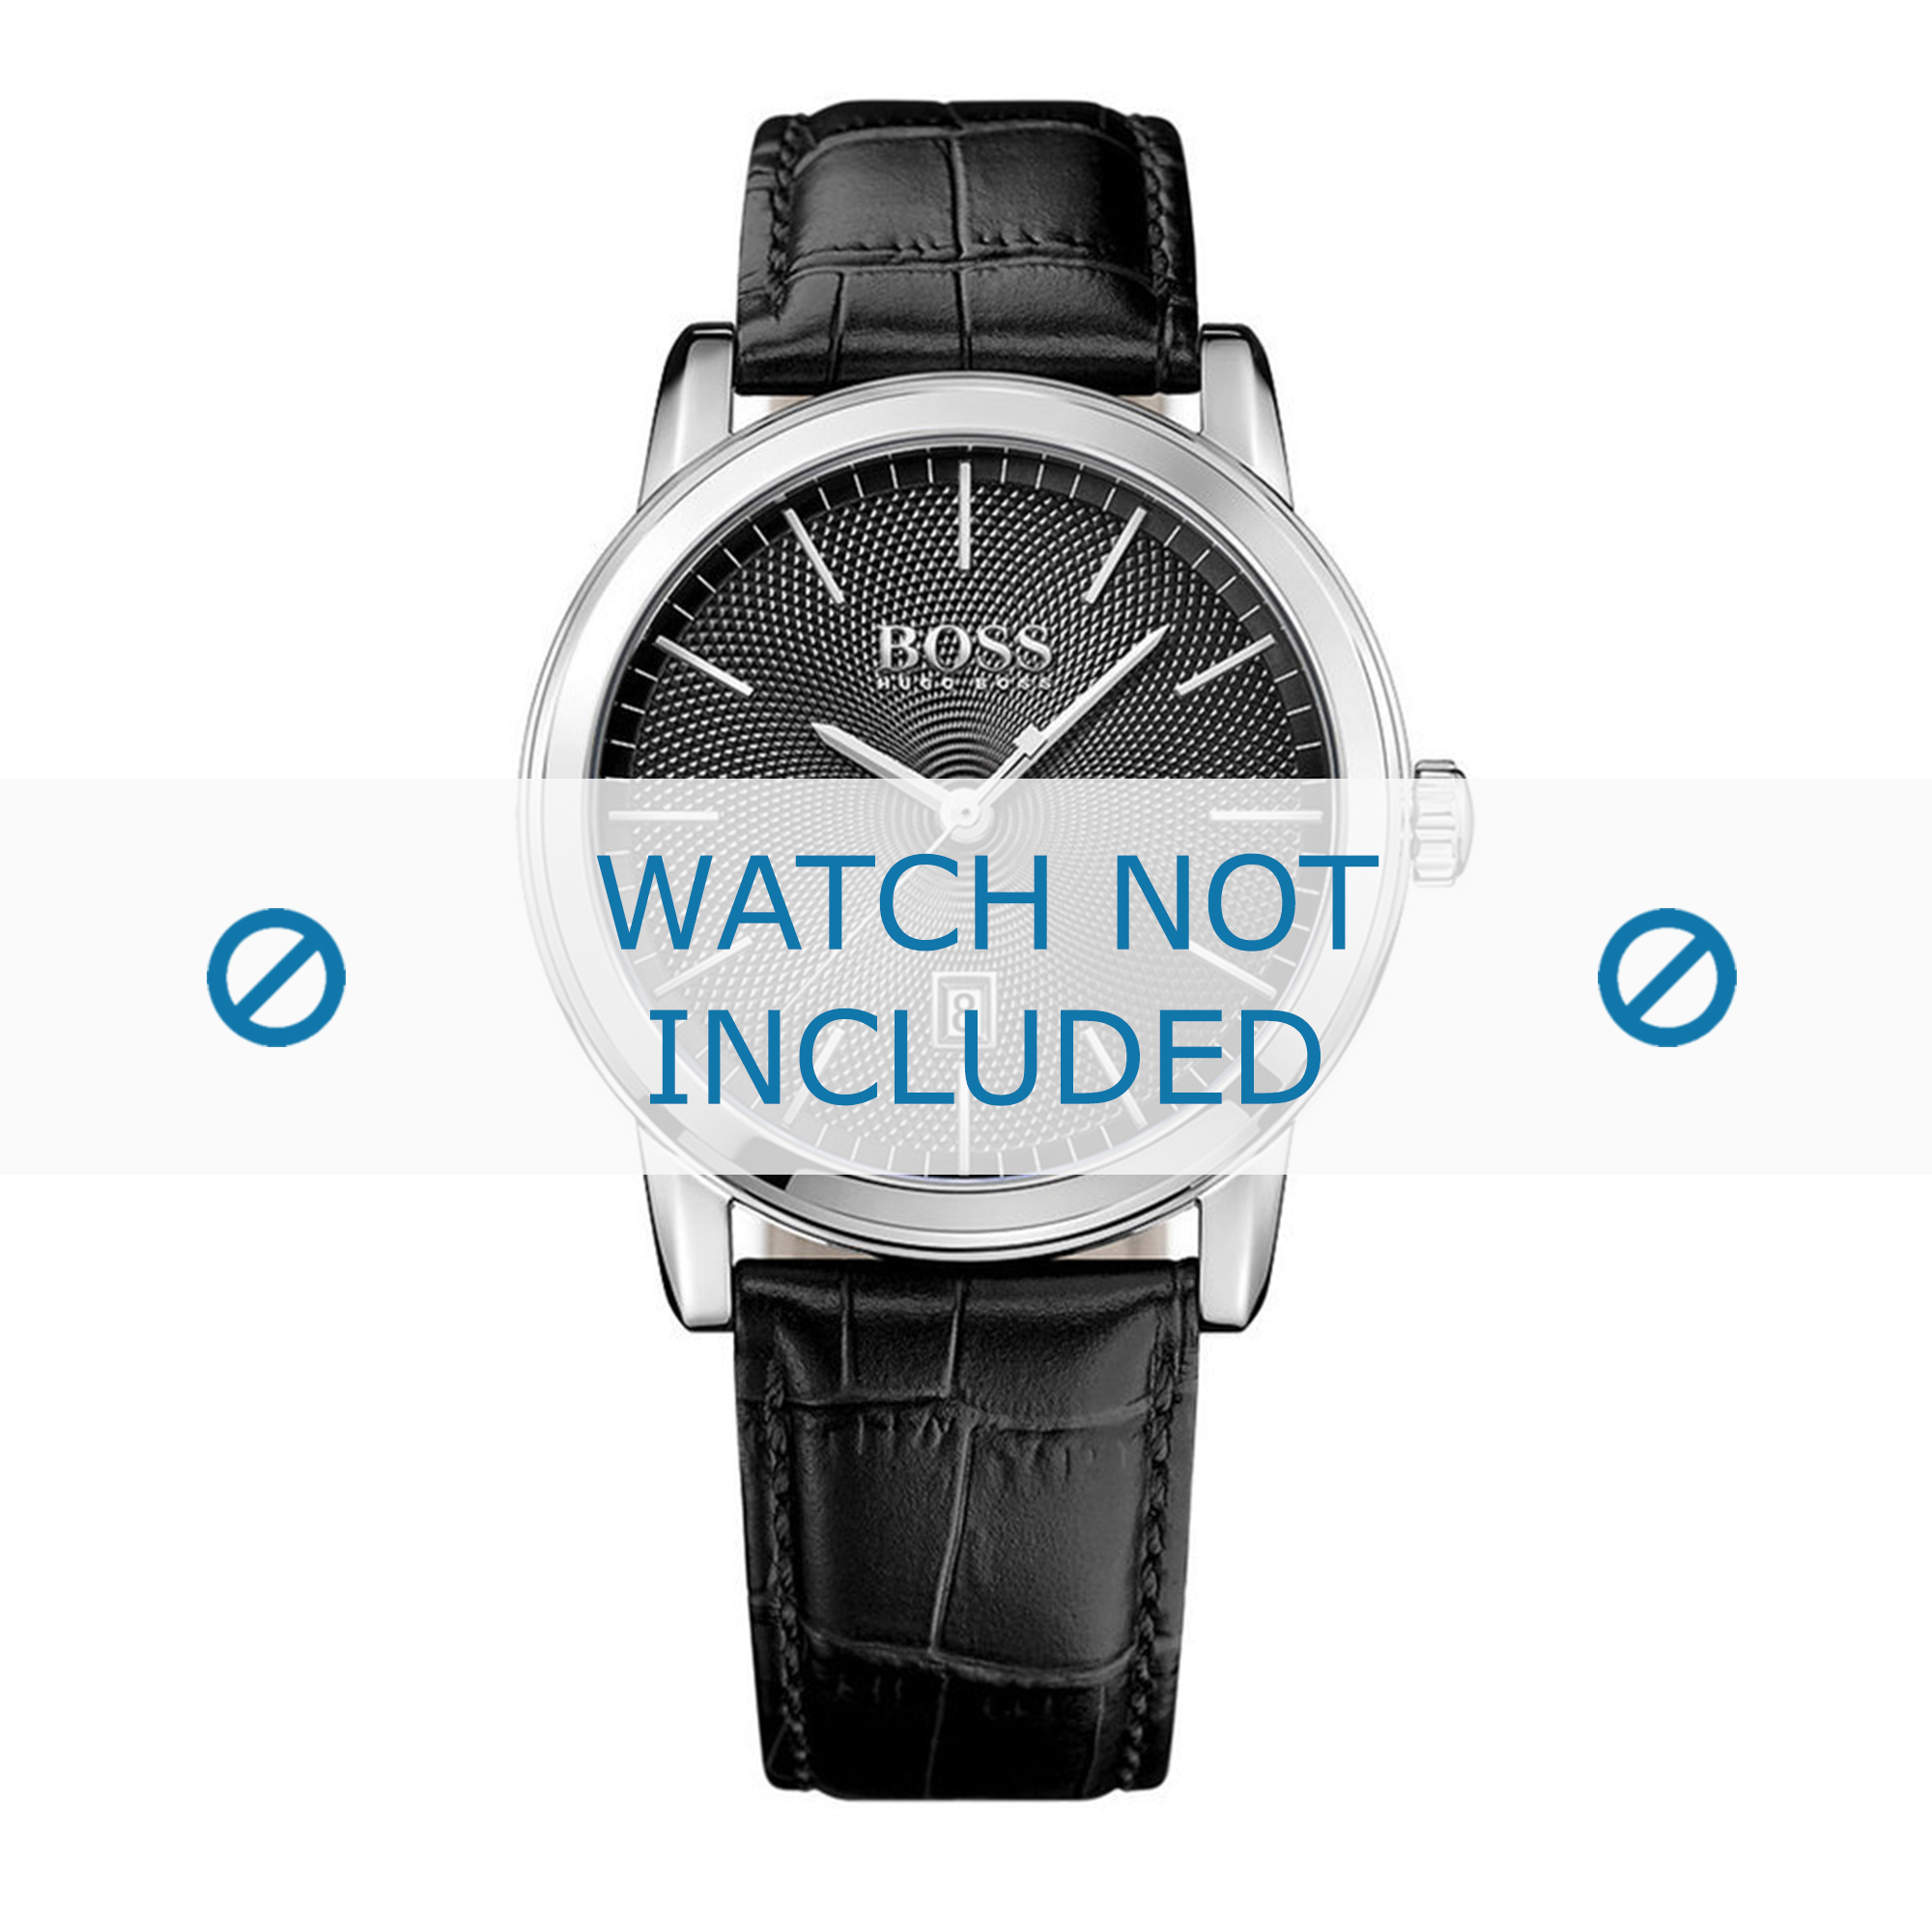 Hugo Boss horlogeband HB-287-1-14-2921-HB1513397 Croco leder Zwart + zwart stiksel